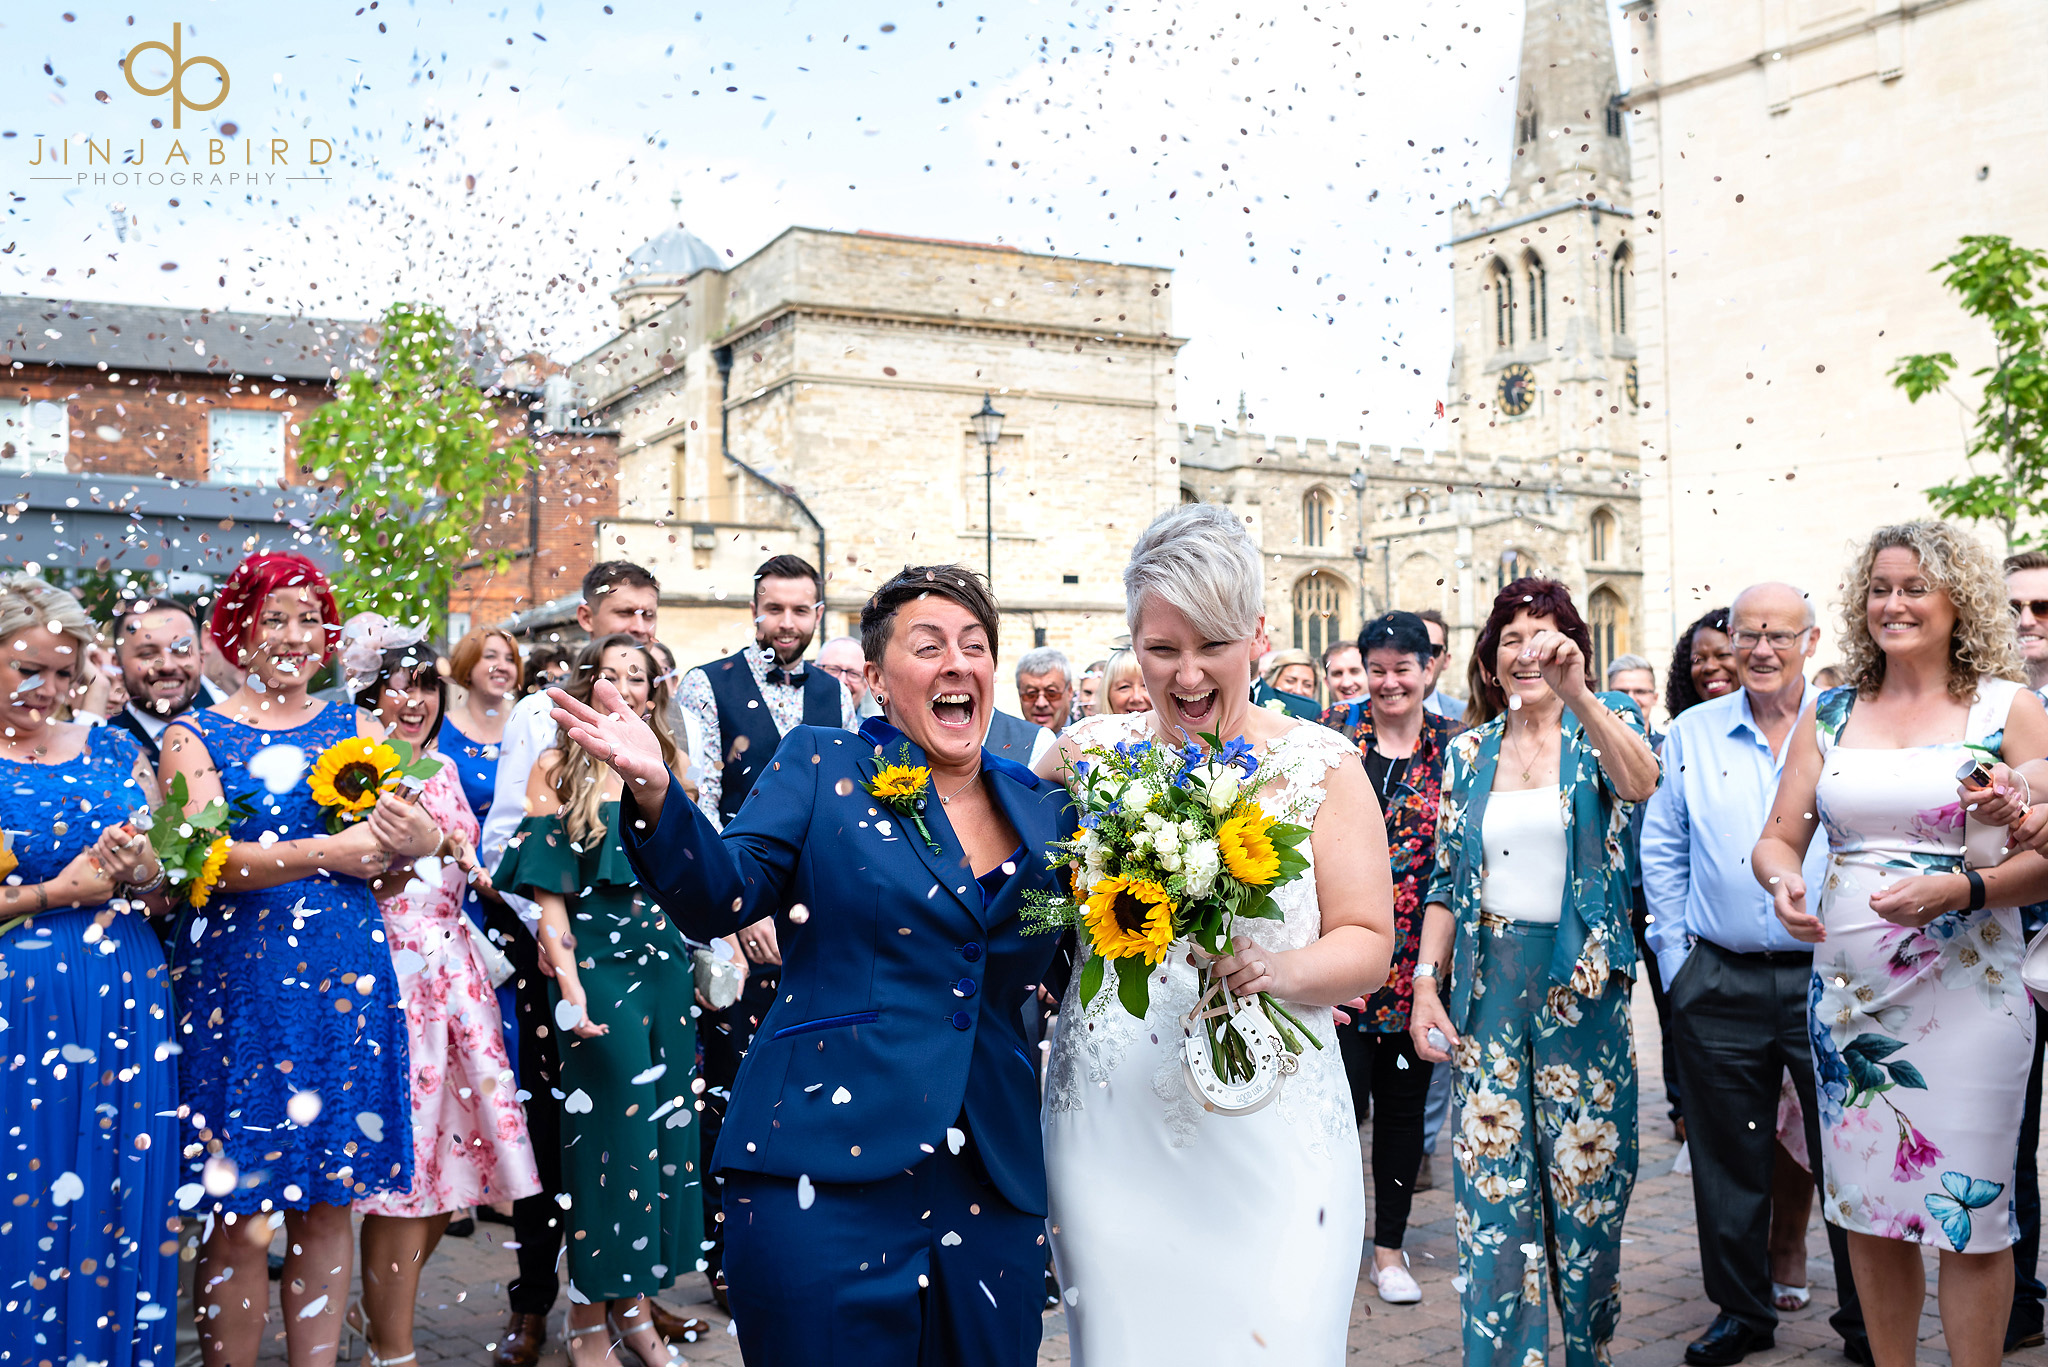 wedding confetti bedford registery office